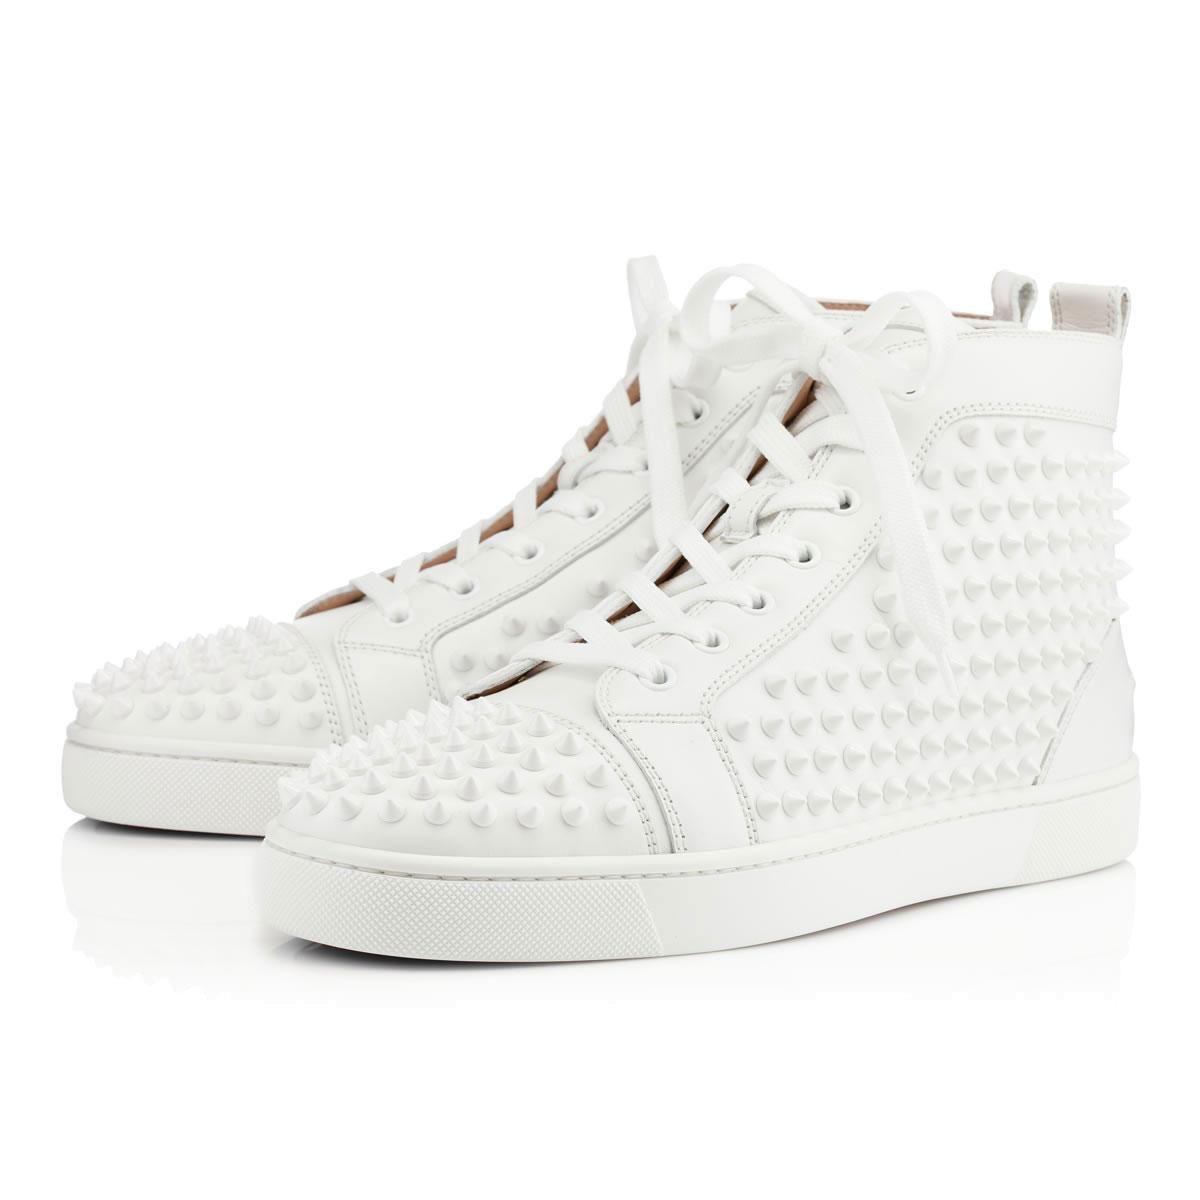 2020 Pico Sock Sneakers Homens Low Top Casual Mulheres Pull-na sapatilha de Luxo Chunky Plano Sock Sapatos clássico Donna Red sola de borracha